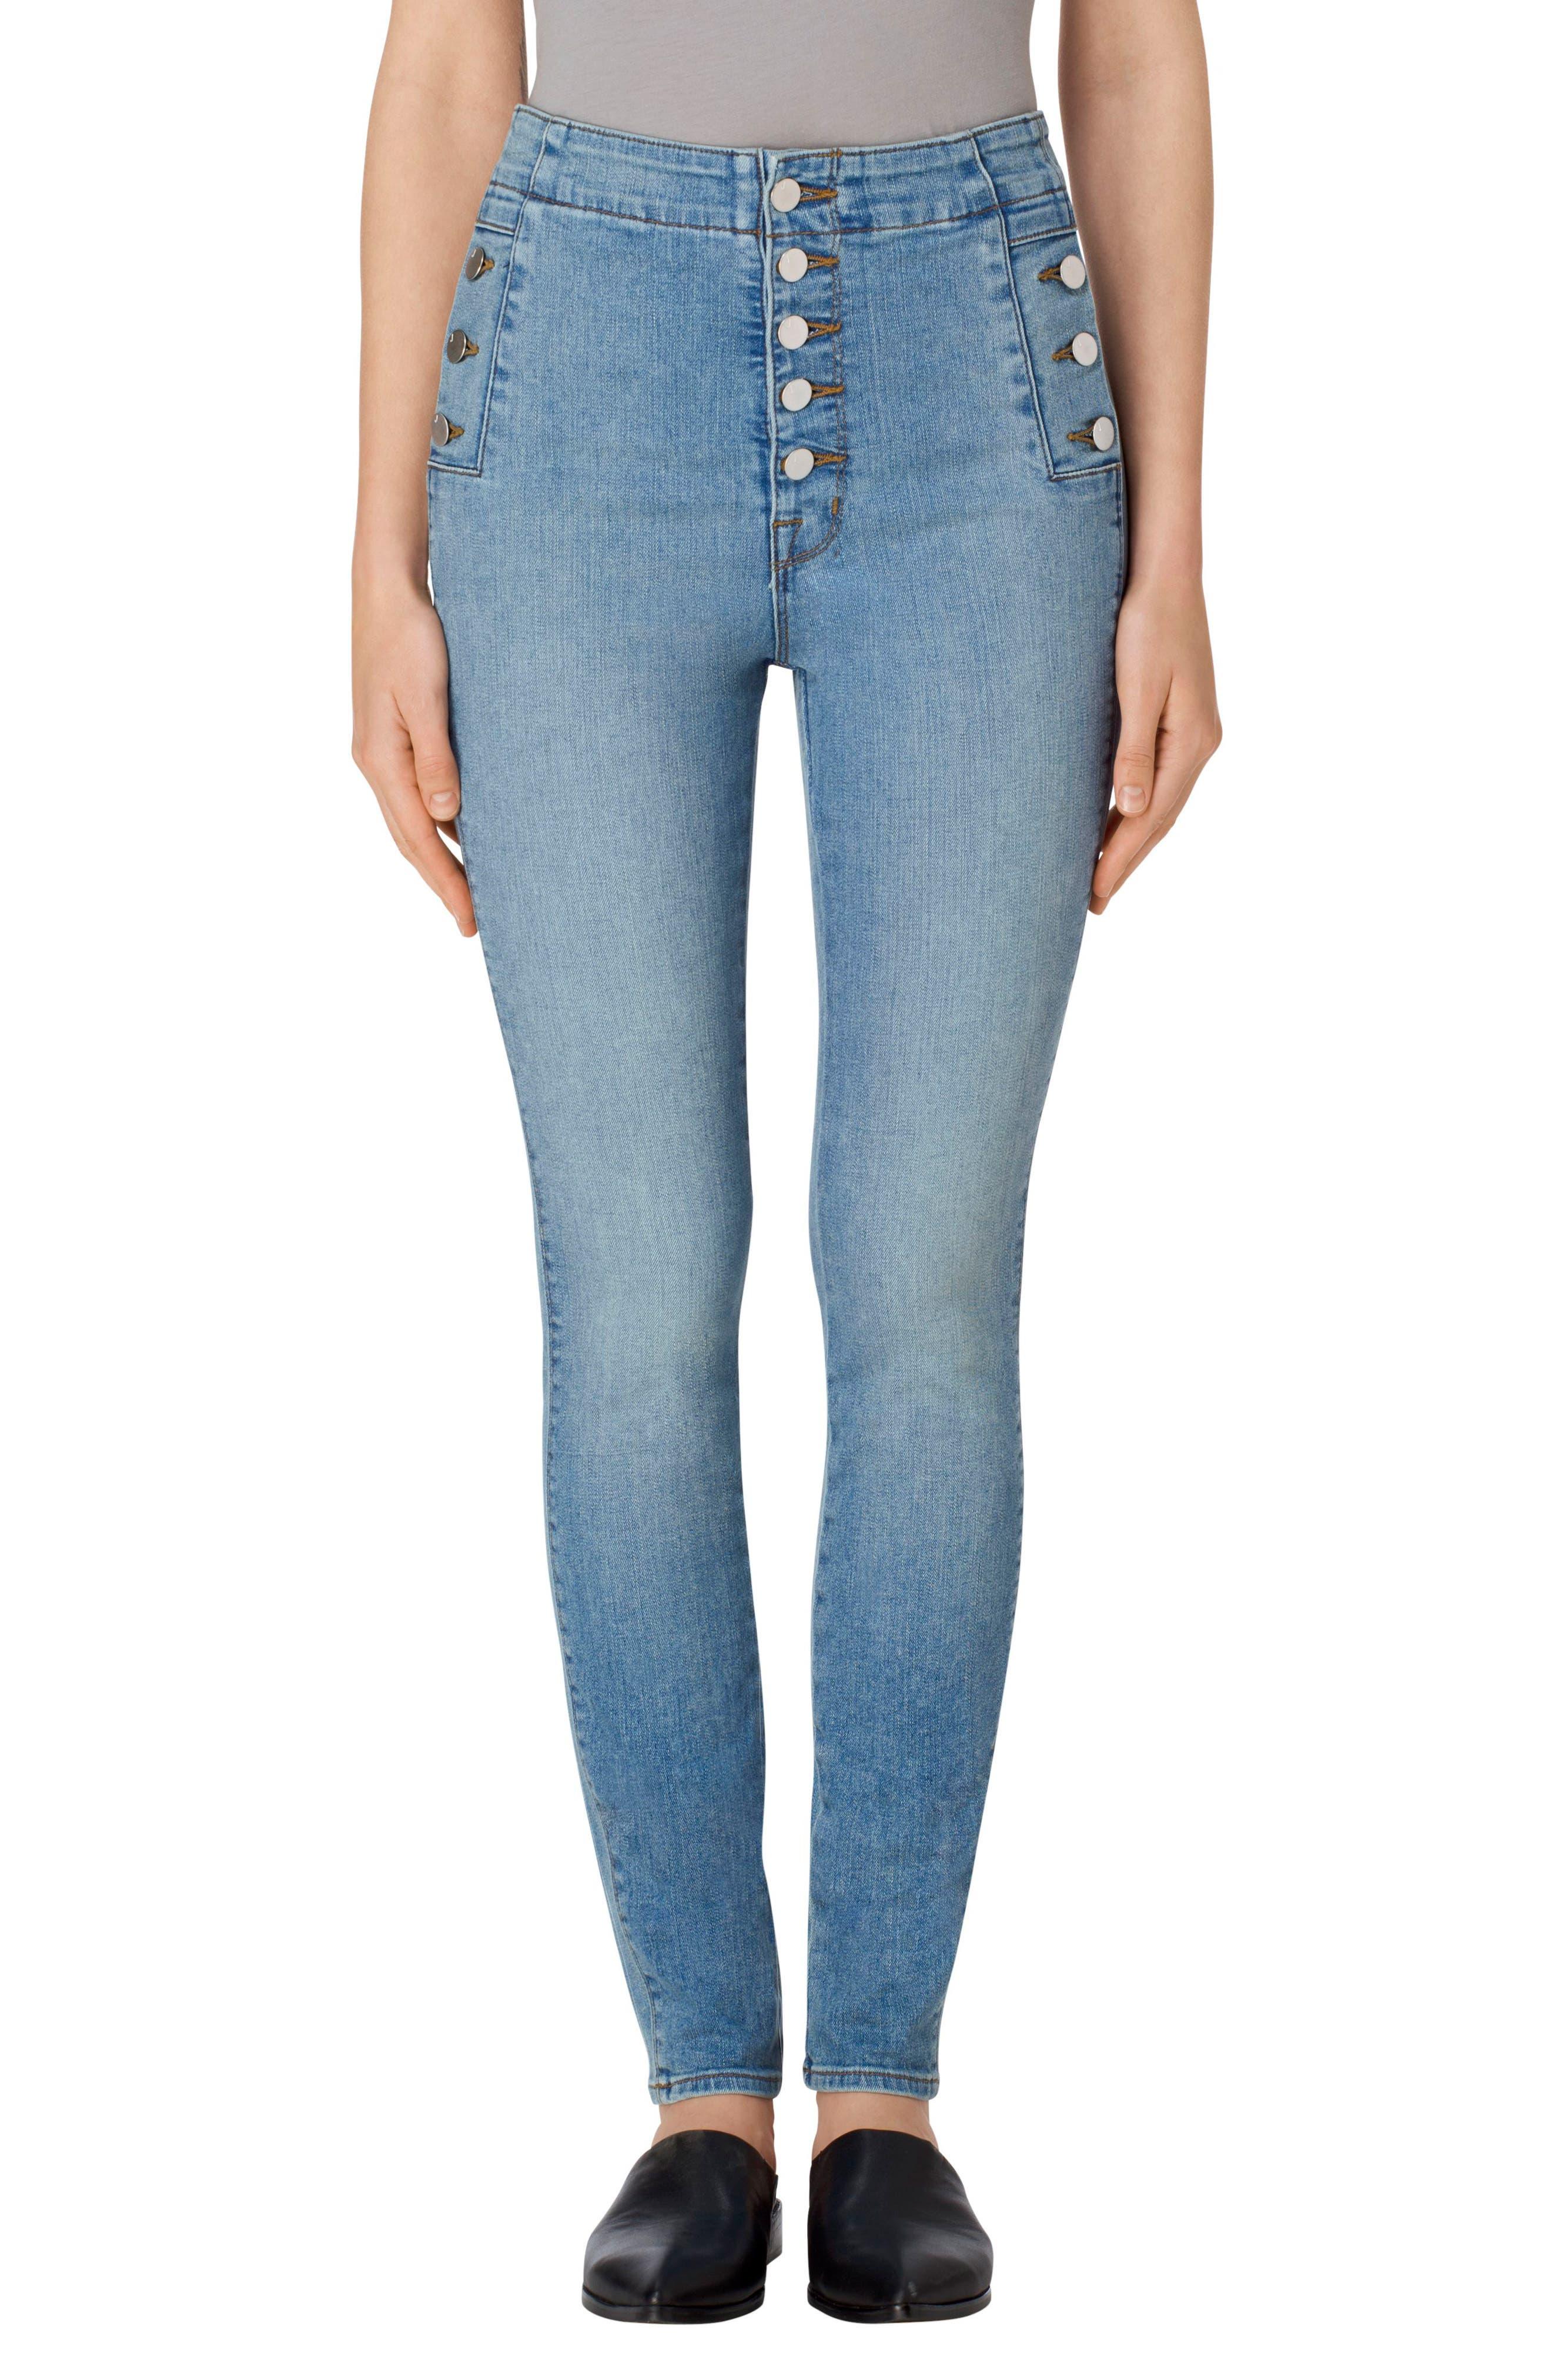 Alternate Image 1 Selected - J Brand Natasha Sky High High Waist Skinny Jeans